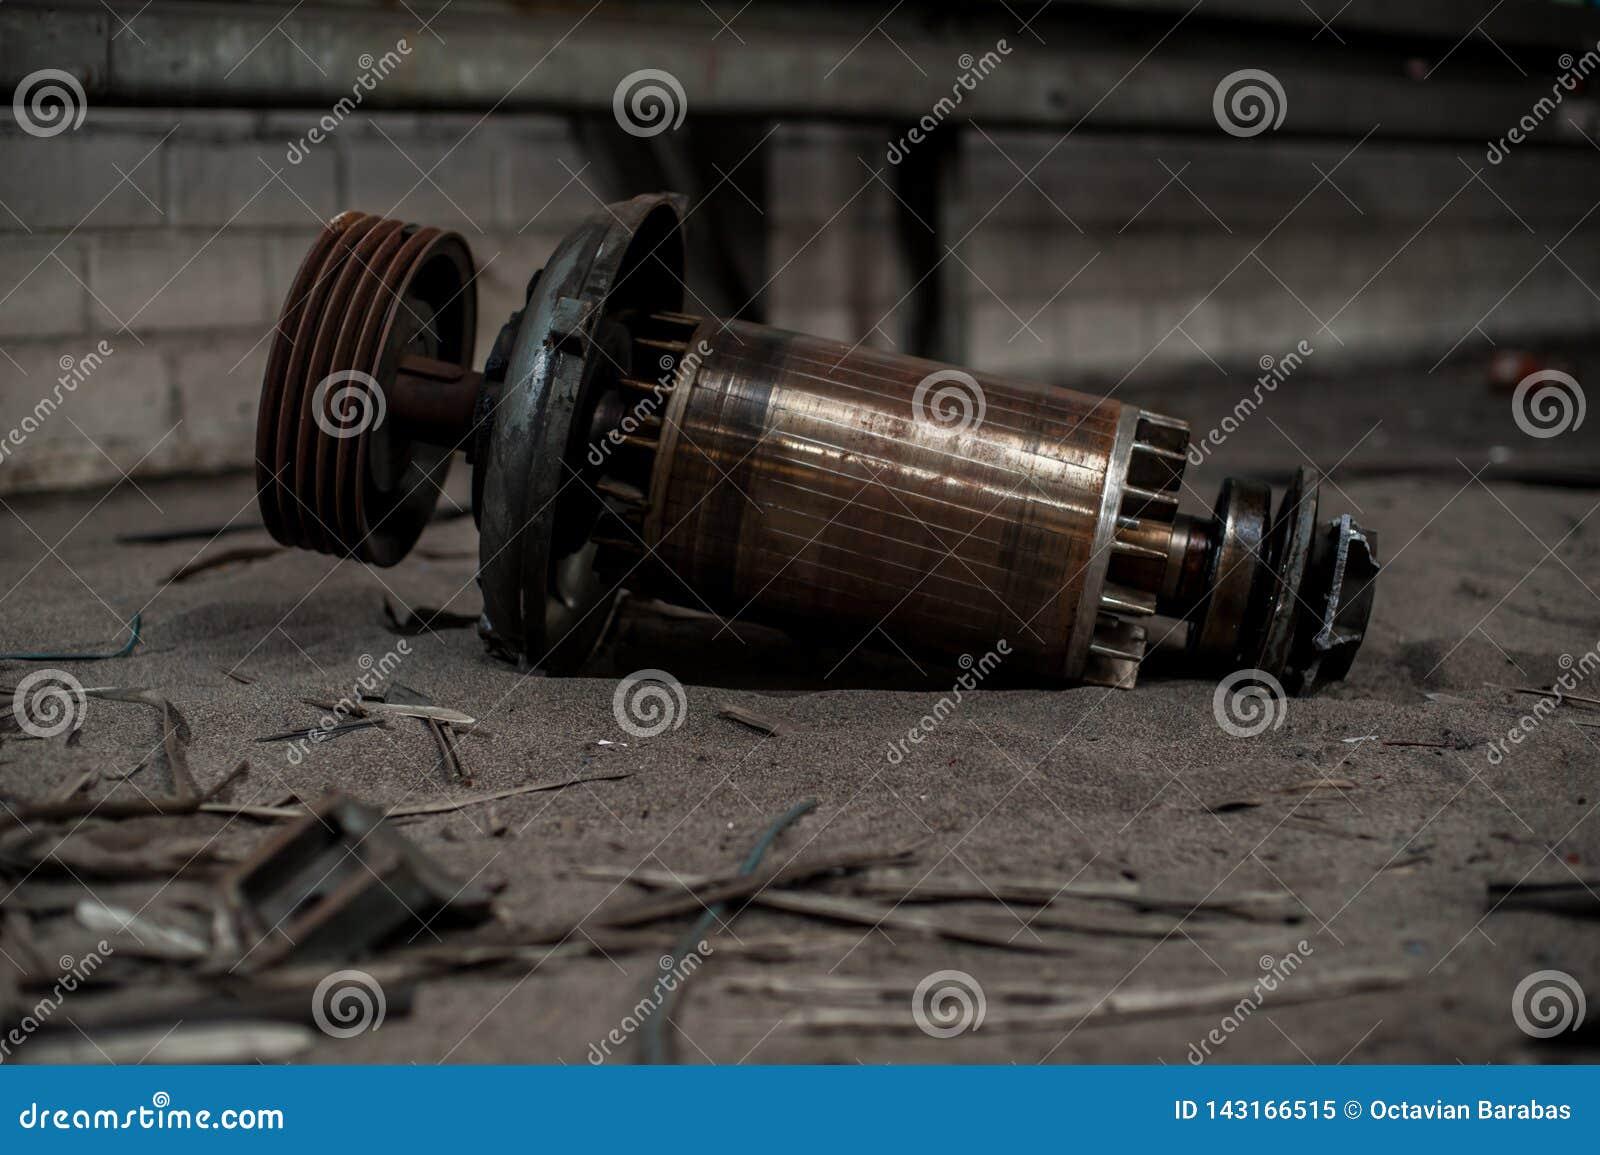 Huge core of electric motor in industrial ruins